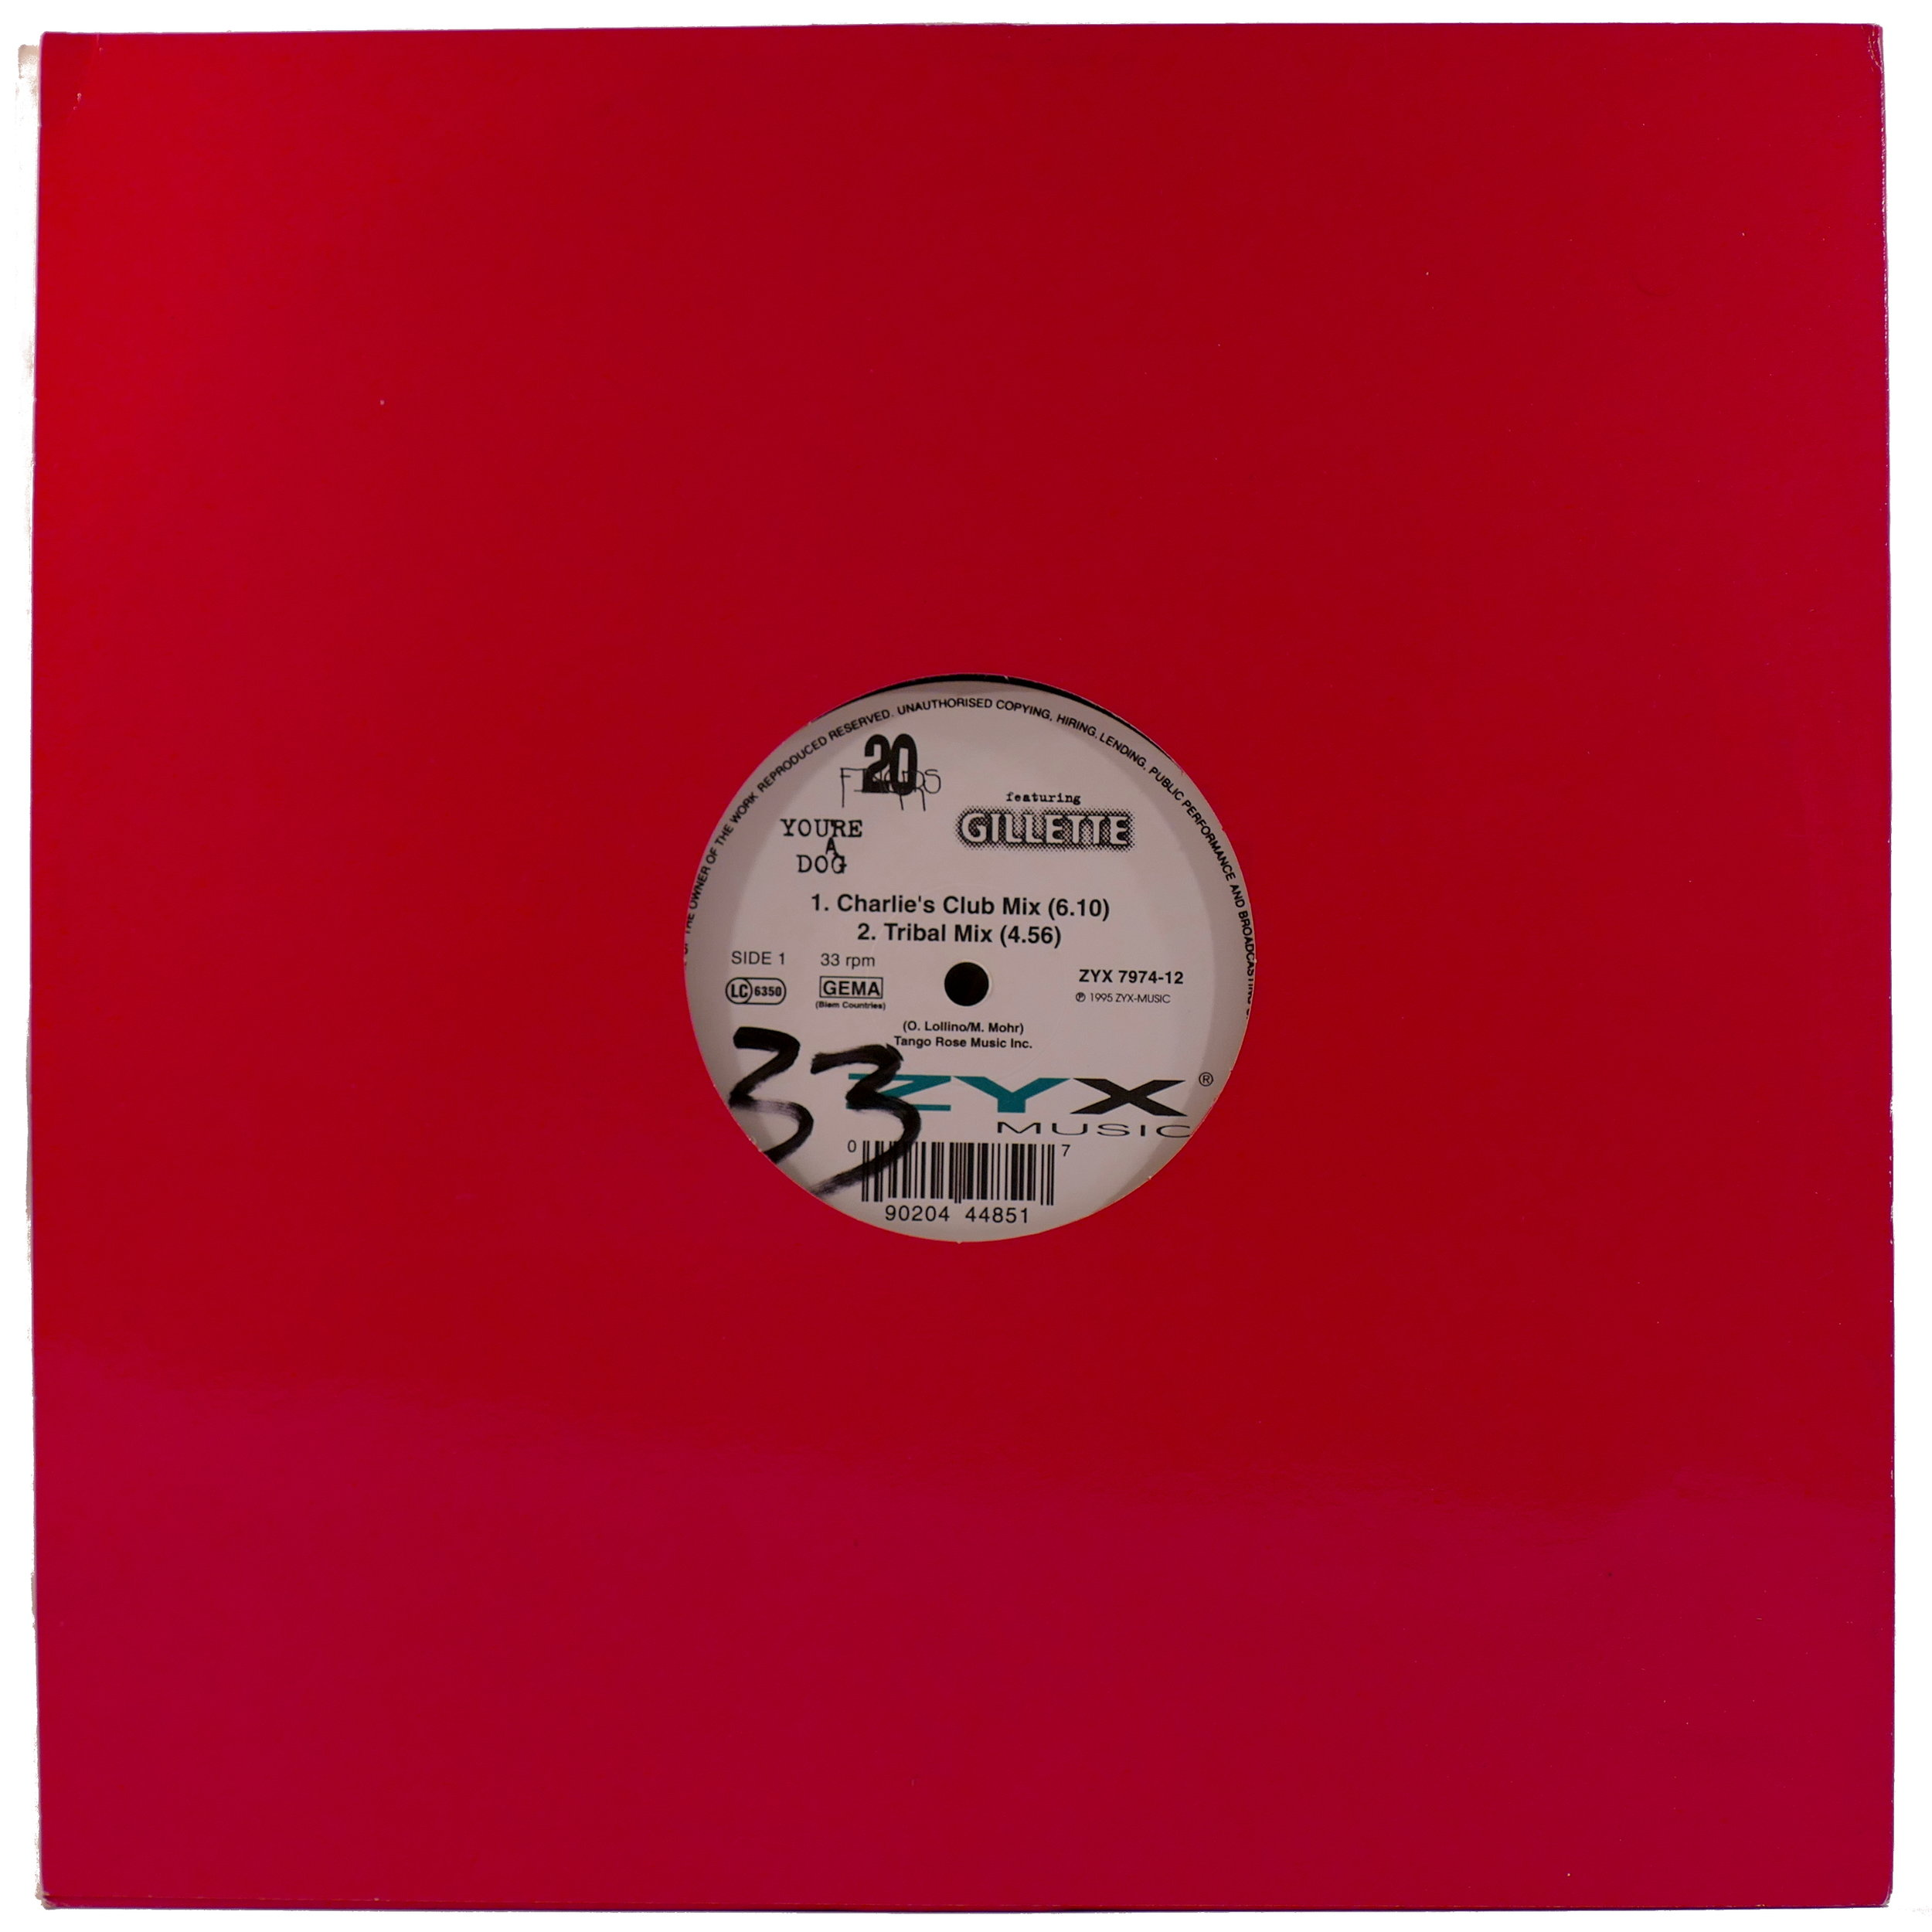 WLWLTDOO-1995-12-GILLETTE-YOD-ZYX-A.JPG